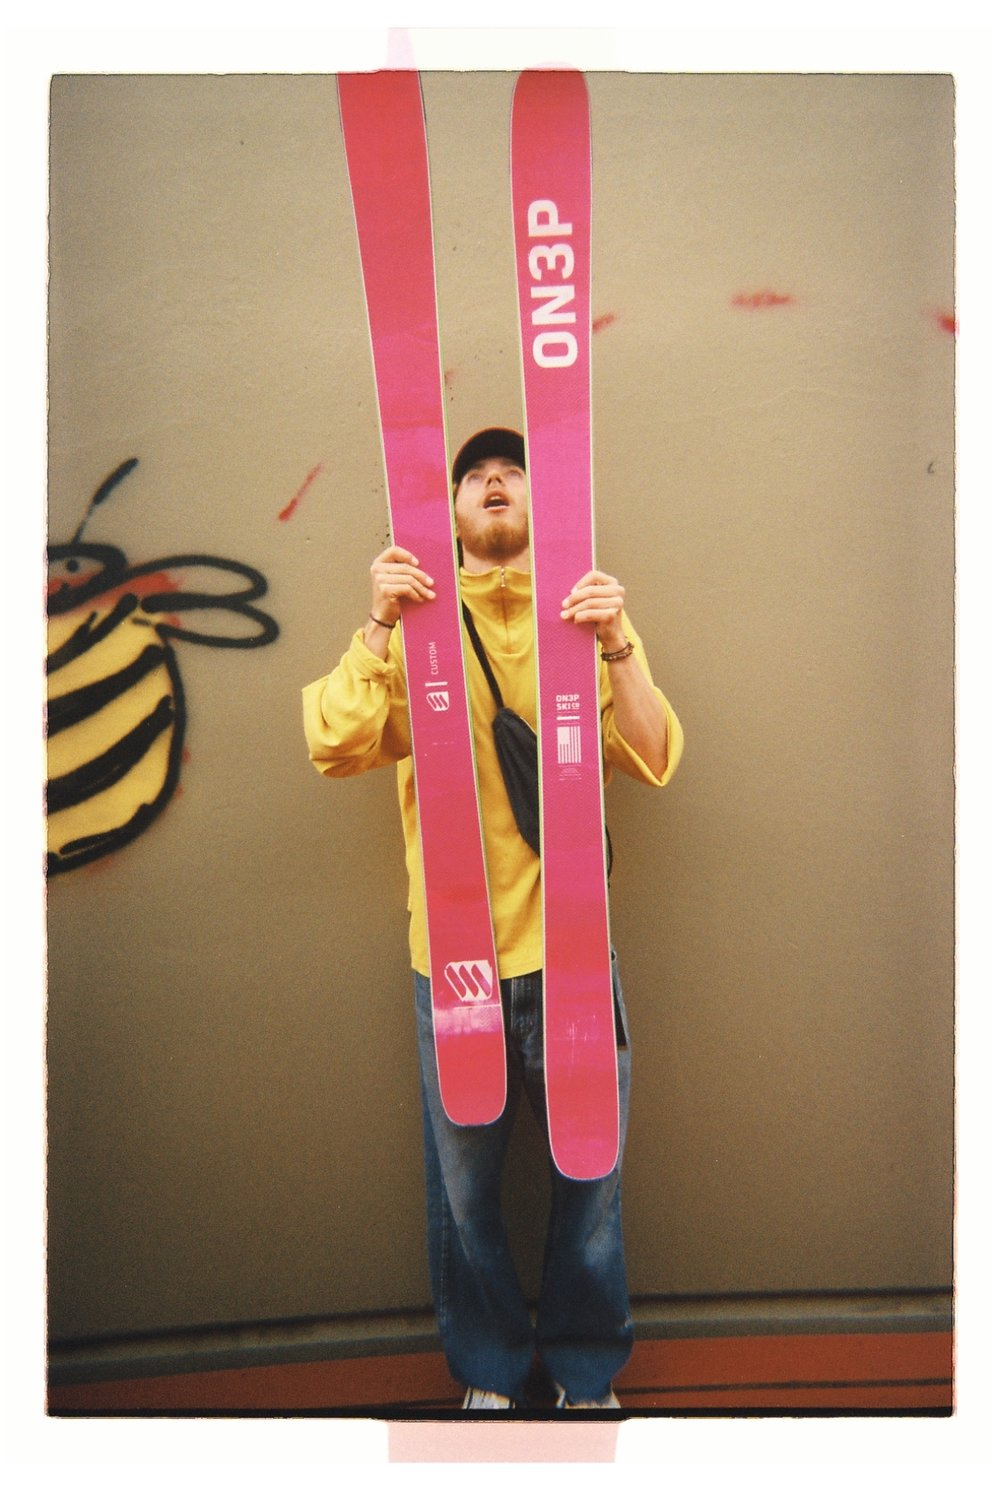 ON3P-Factory-Portland-OR_Gjorde-mina-egna-rosa-skidor-i-fabriken.jpg